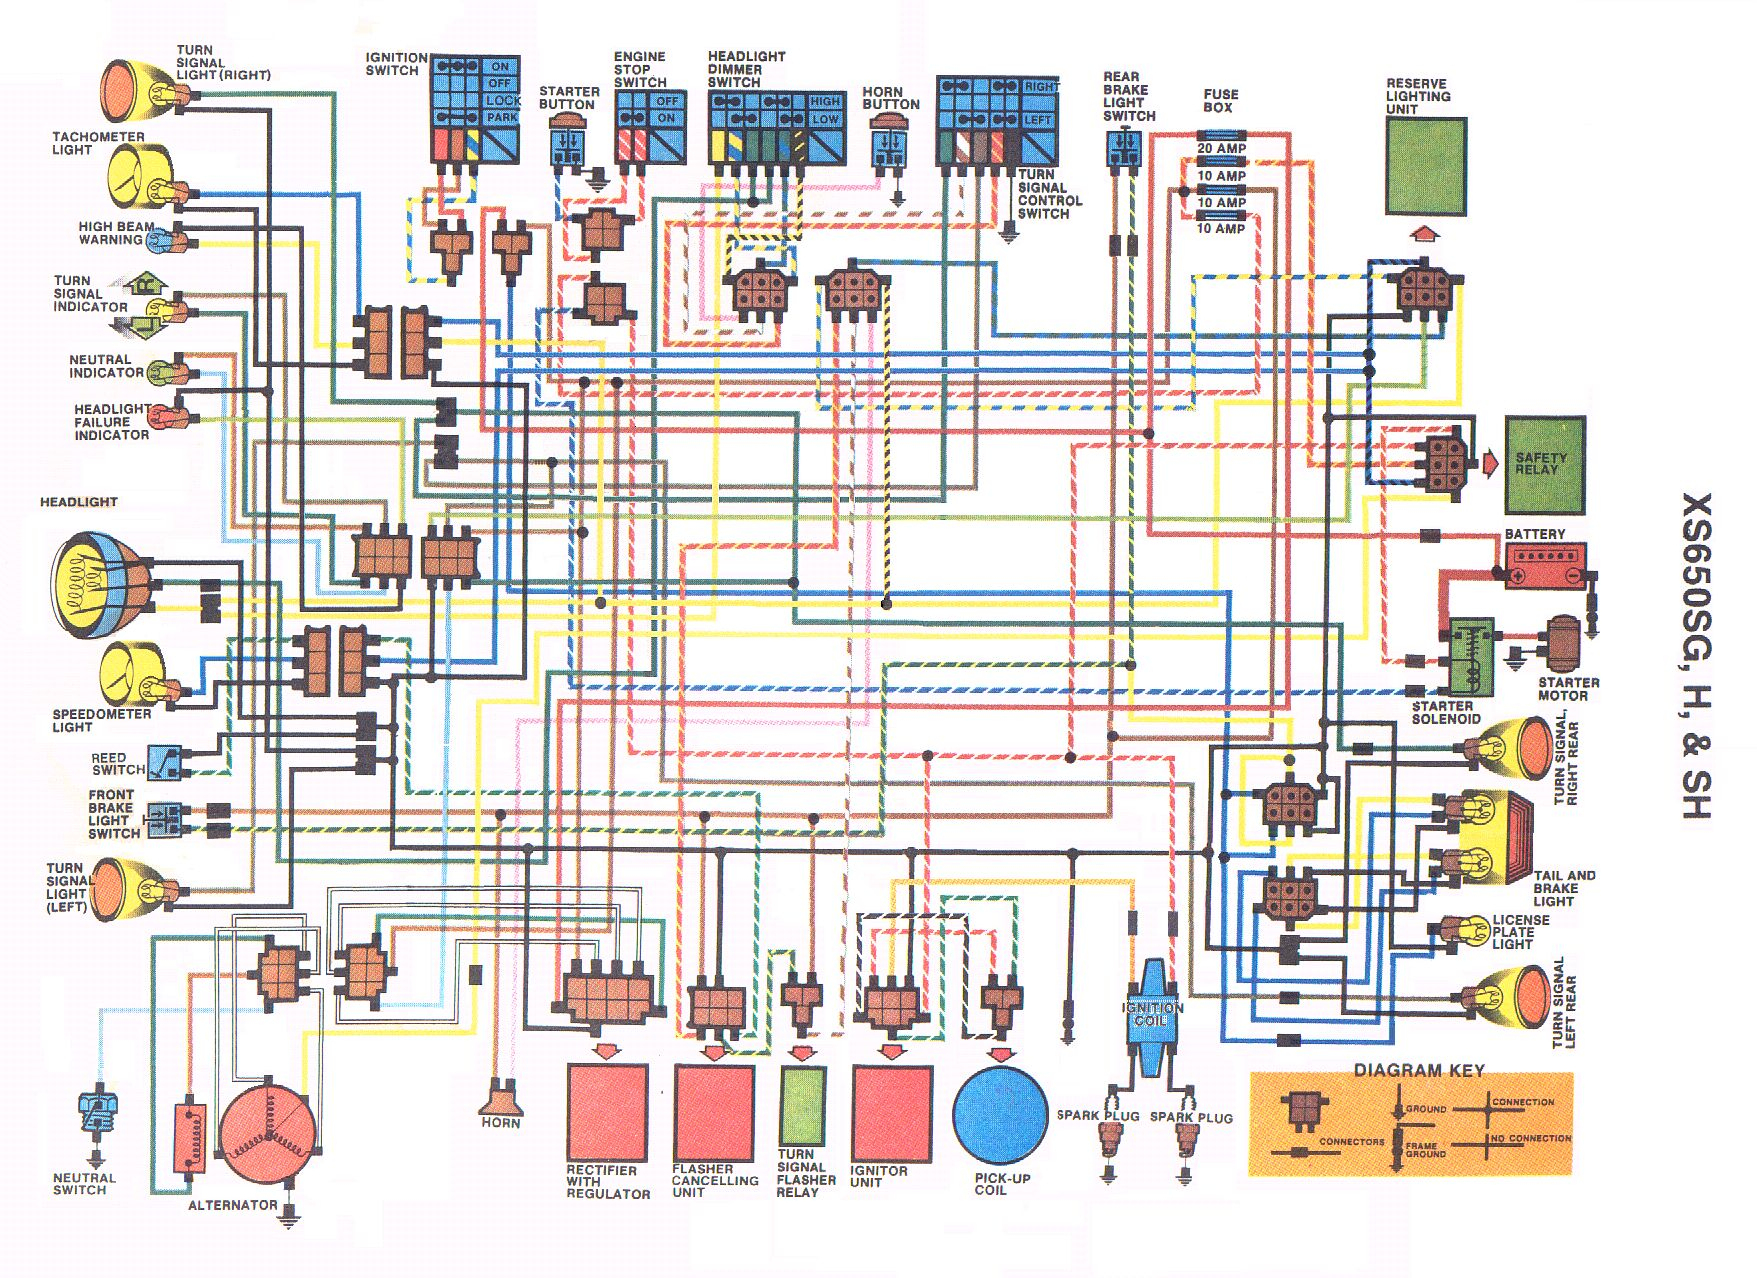 Xs650 Chopper Wiring Diagrams - Xs650 Wiring Diagram